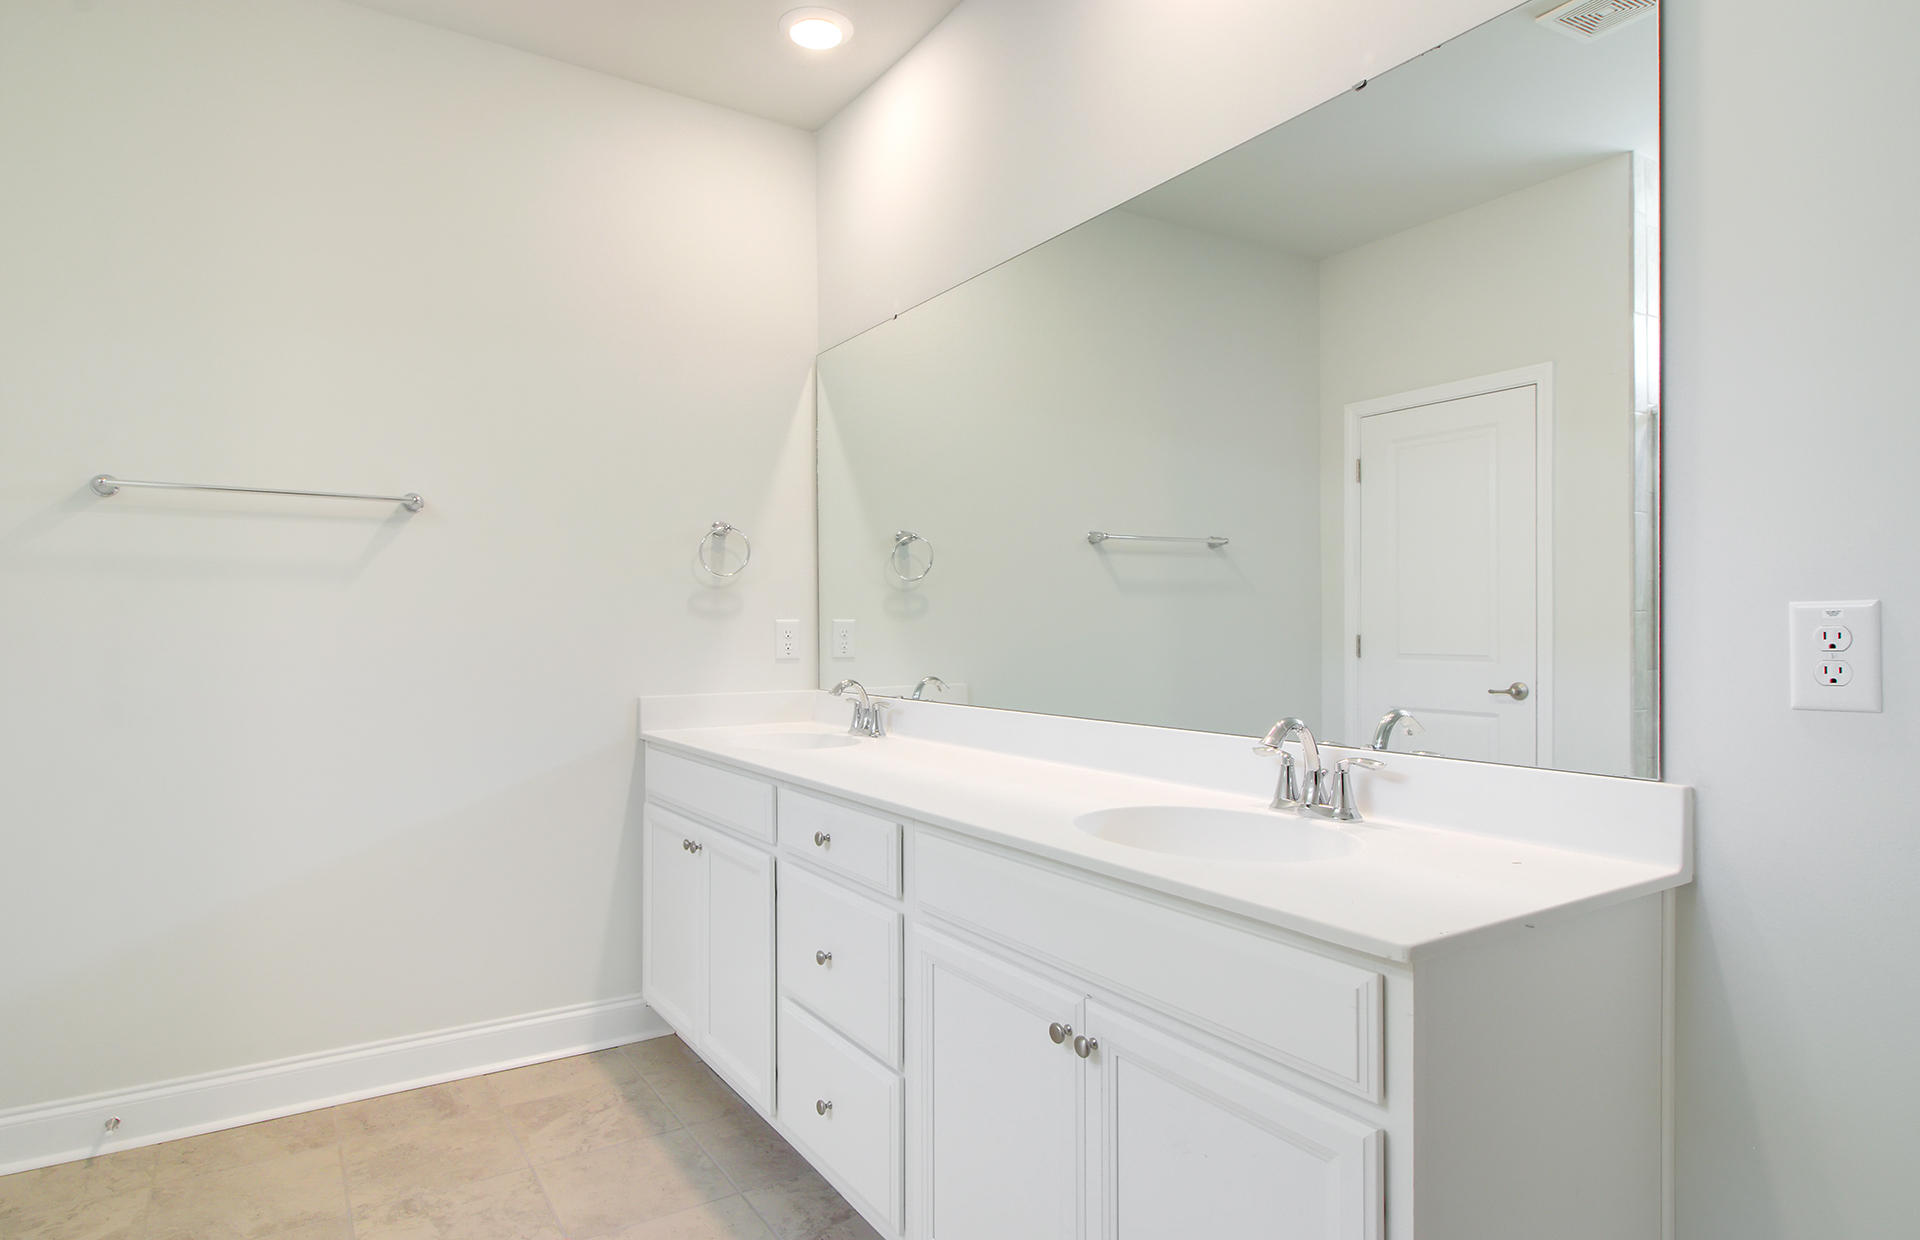 Park West Homes For Sale - 3066 Rice Field, Mount Pleasant, SC - 51